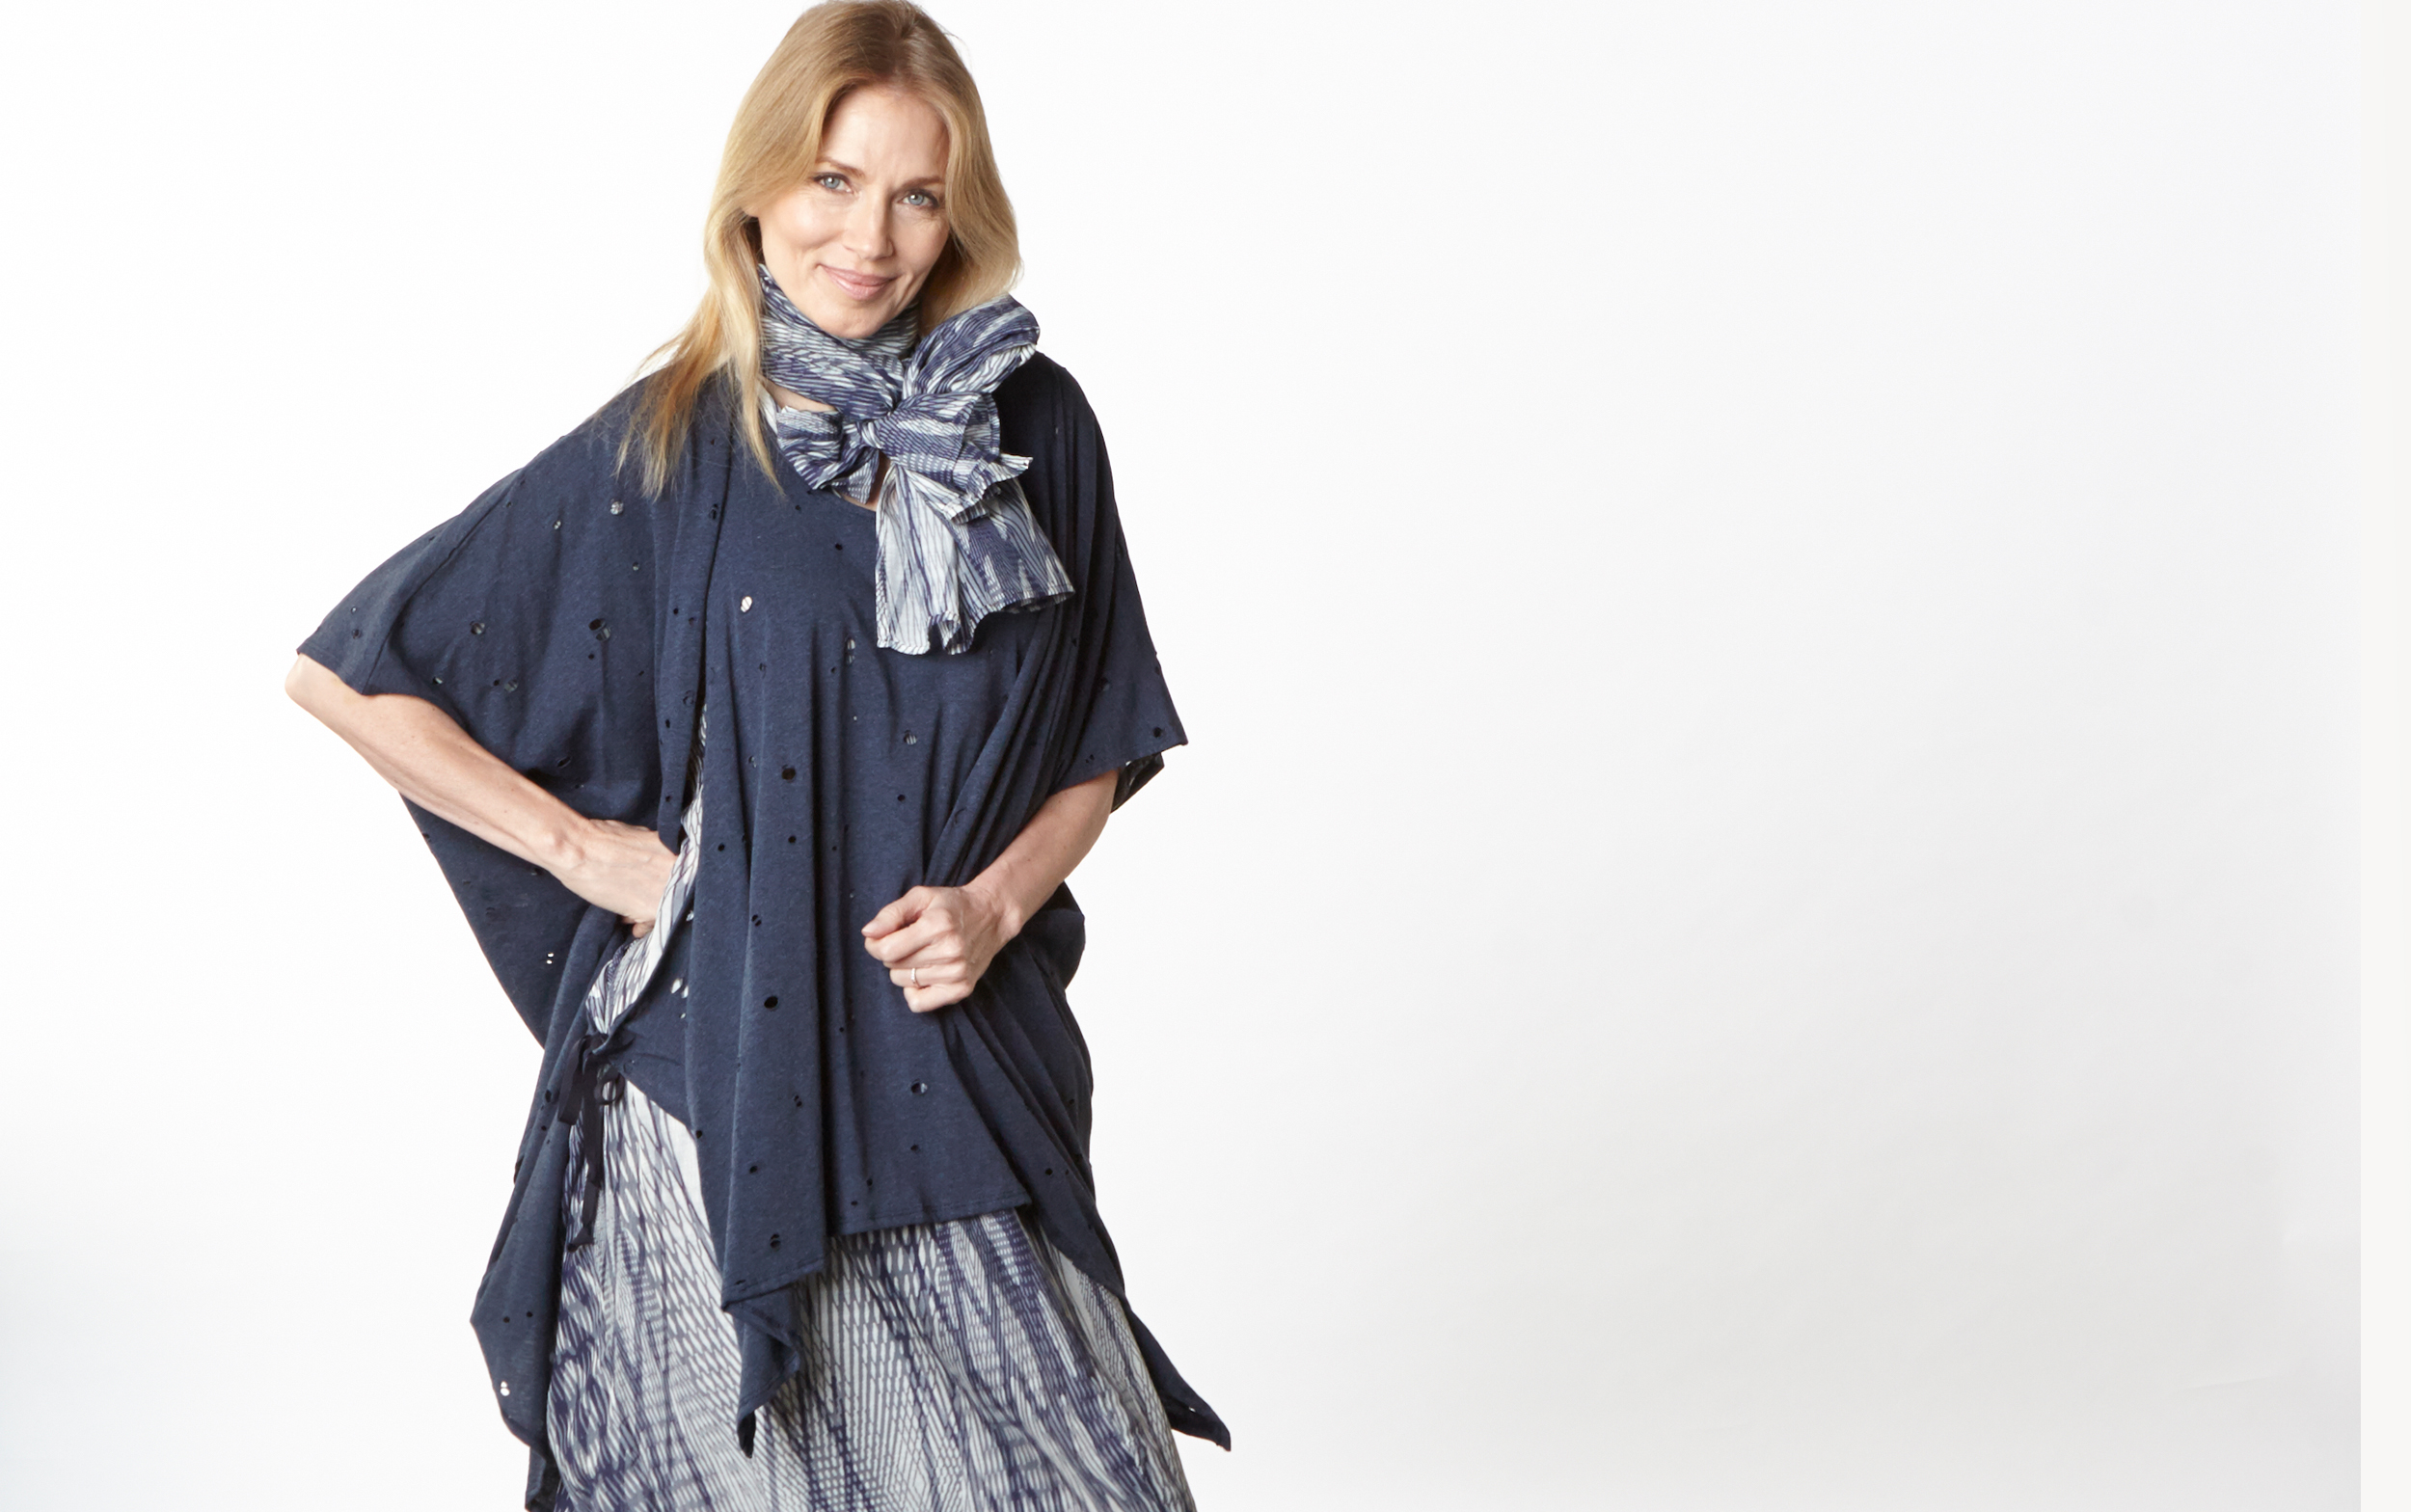 Annette Cardigan, Zara Vest in Navy Italian Fori Jersey, Scarf, Petra Dress in Netto Italian Cotton/Silk